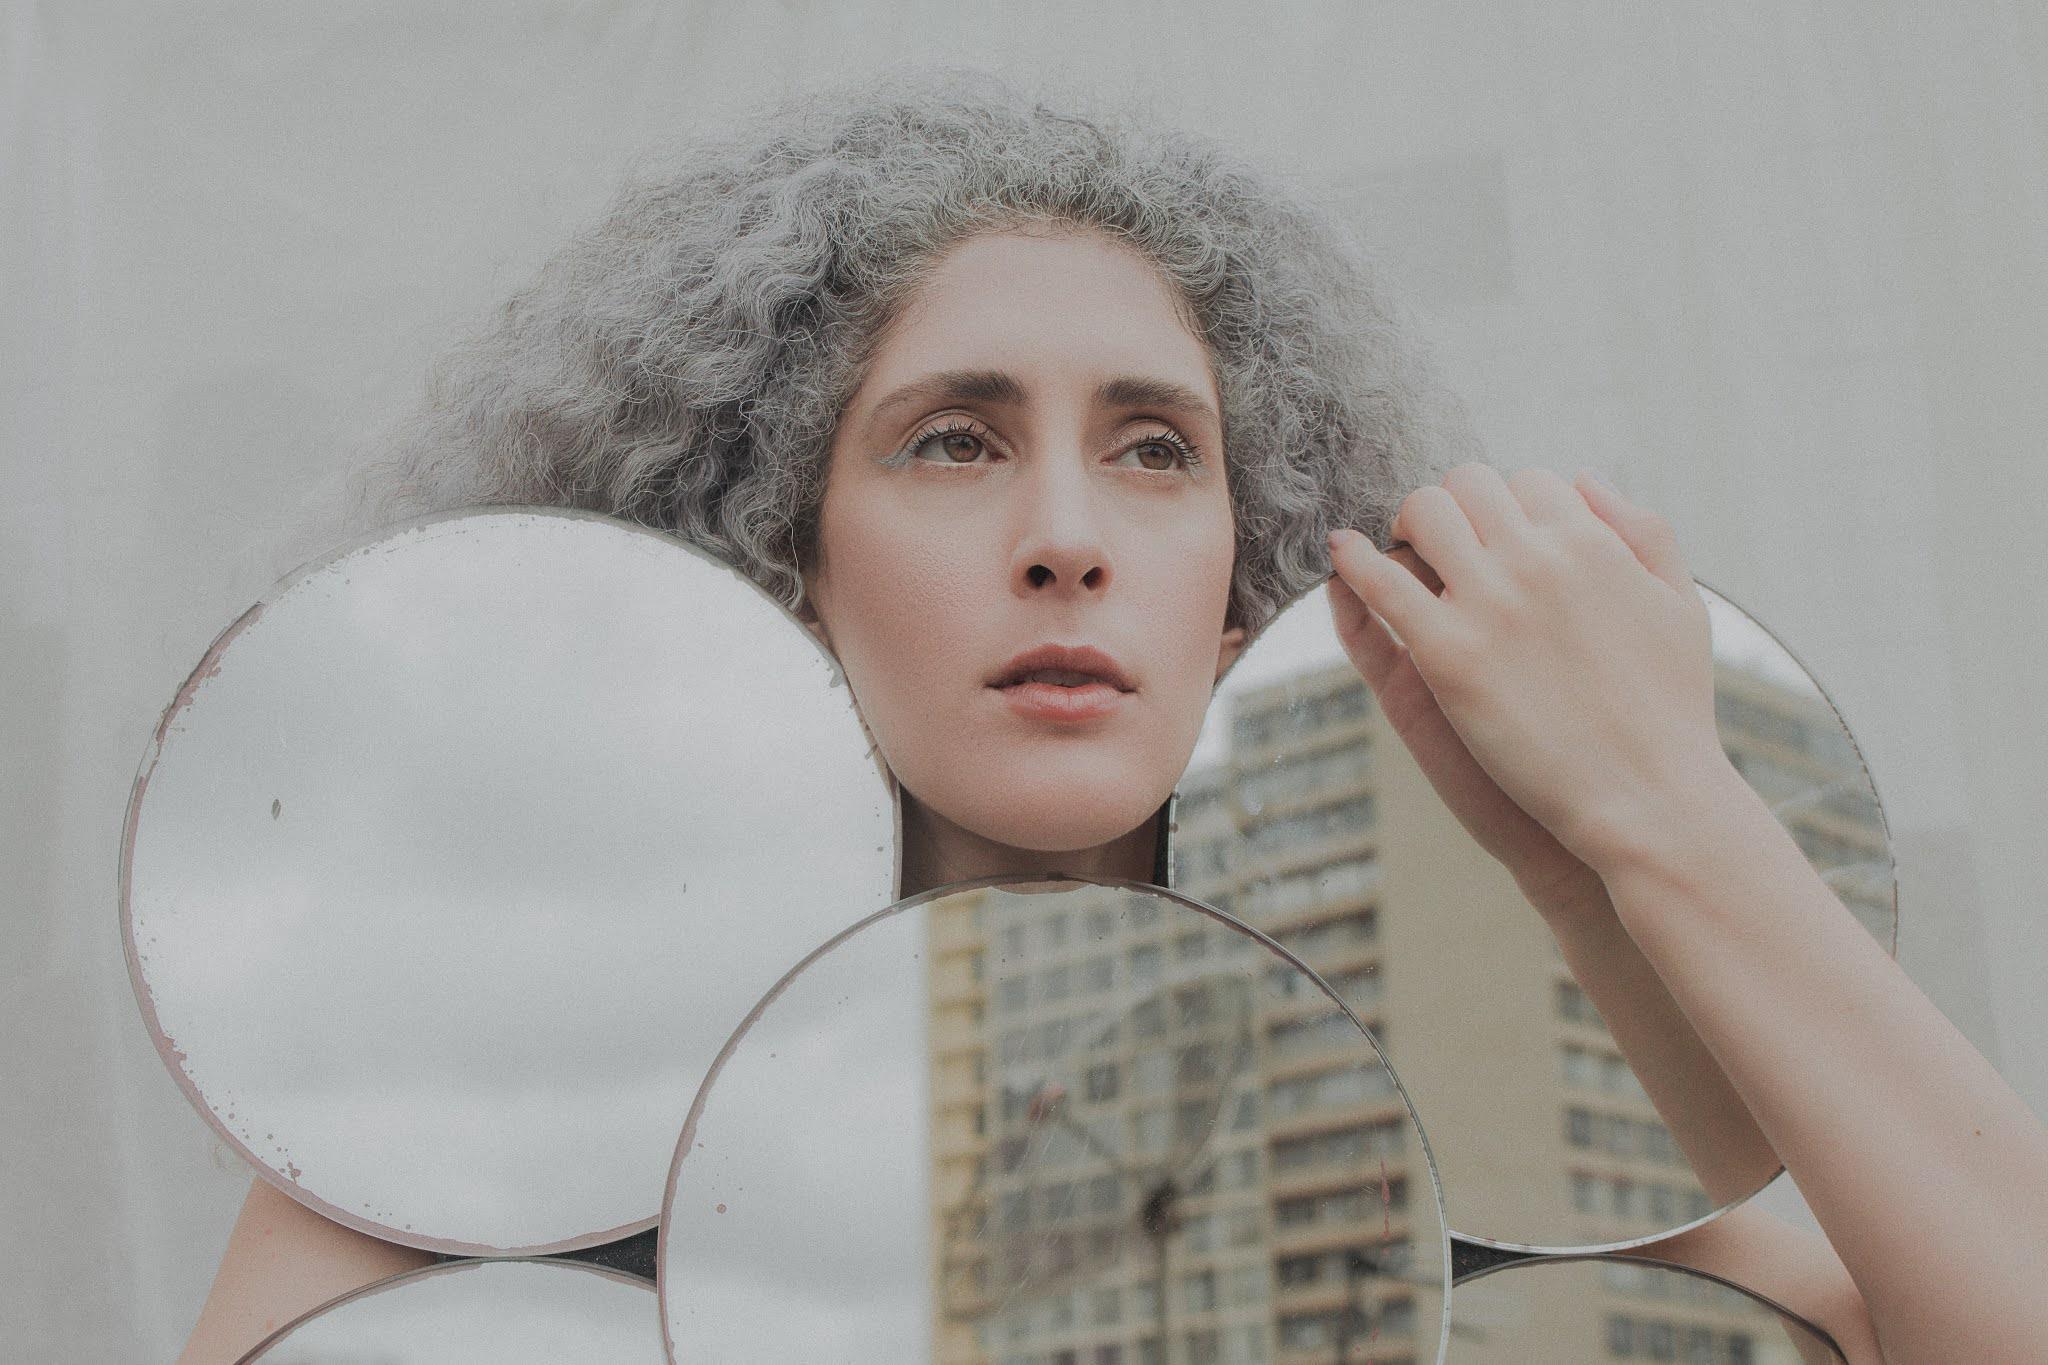 Girl, Reflecting, Holding Mirrors